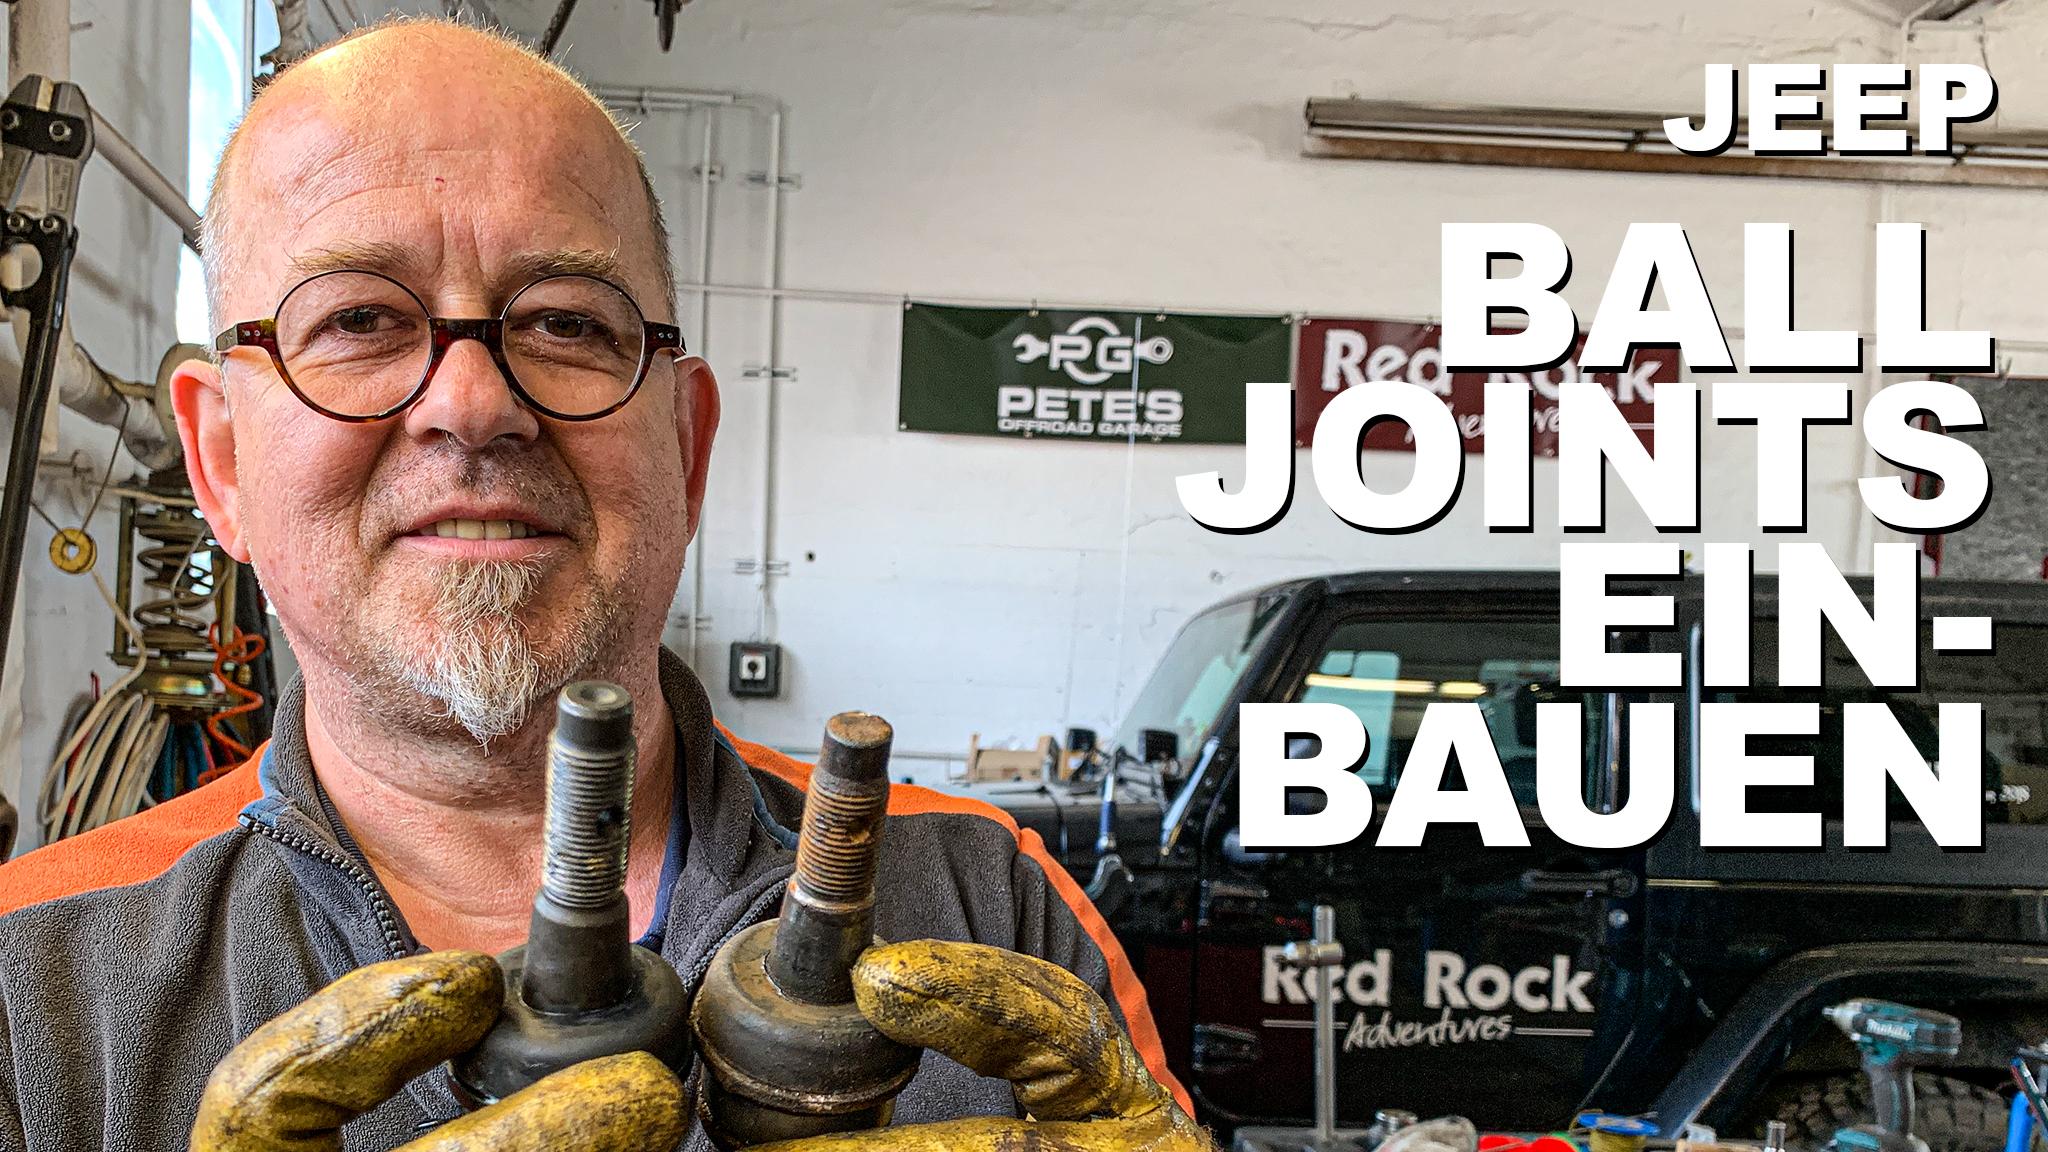 Jeep Ball Joints einbauen - 4x4PASSION #168